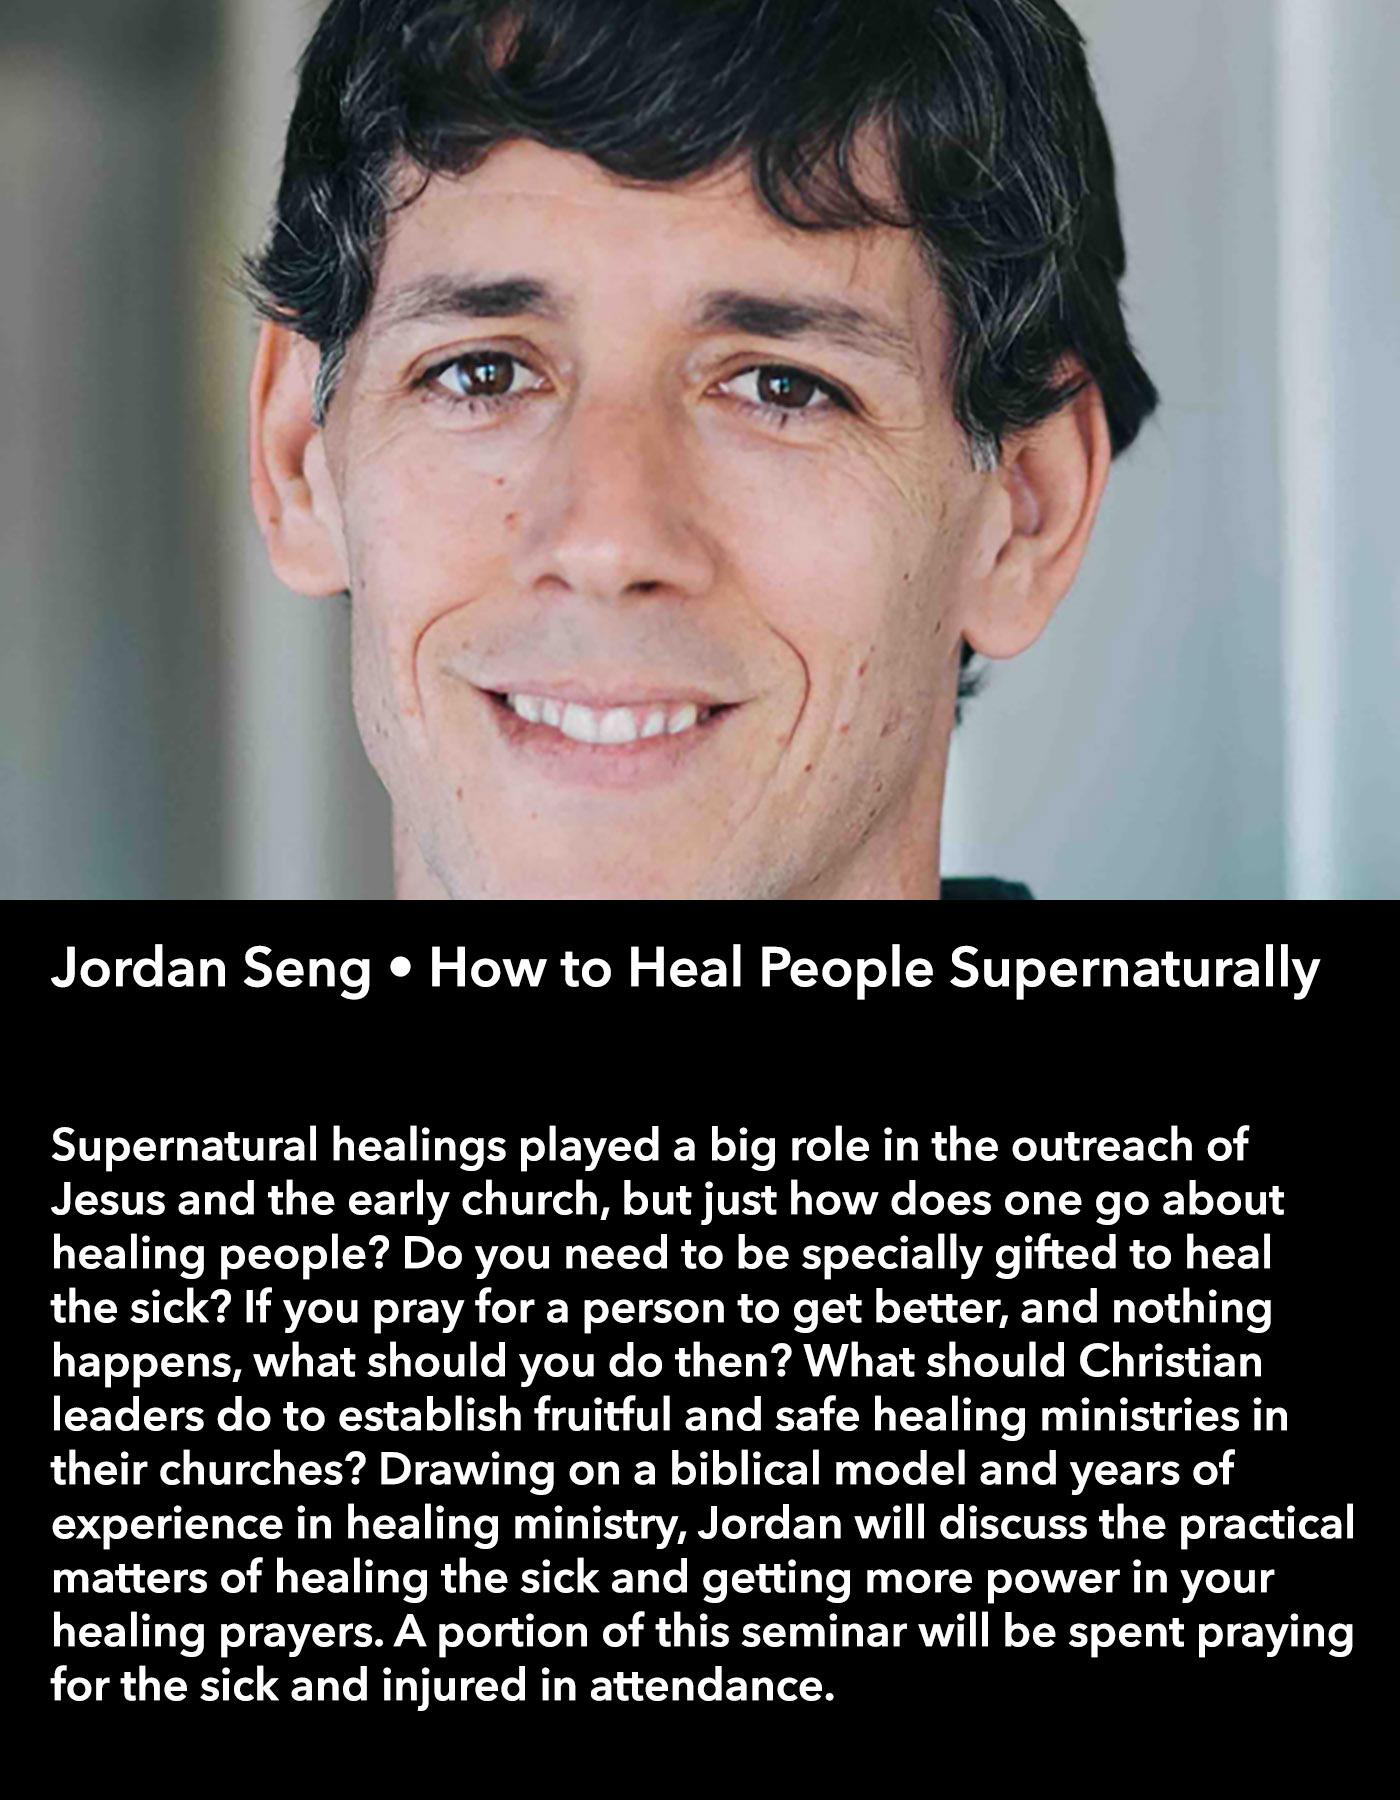 Jordan Seng • How to Heal People Supernaturally • Friday Morning, March 17 • 10:30 – 11:45 am